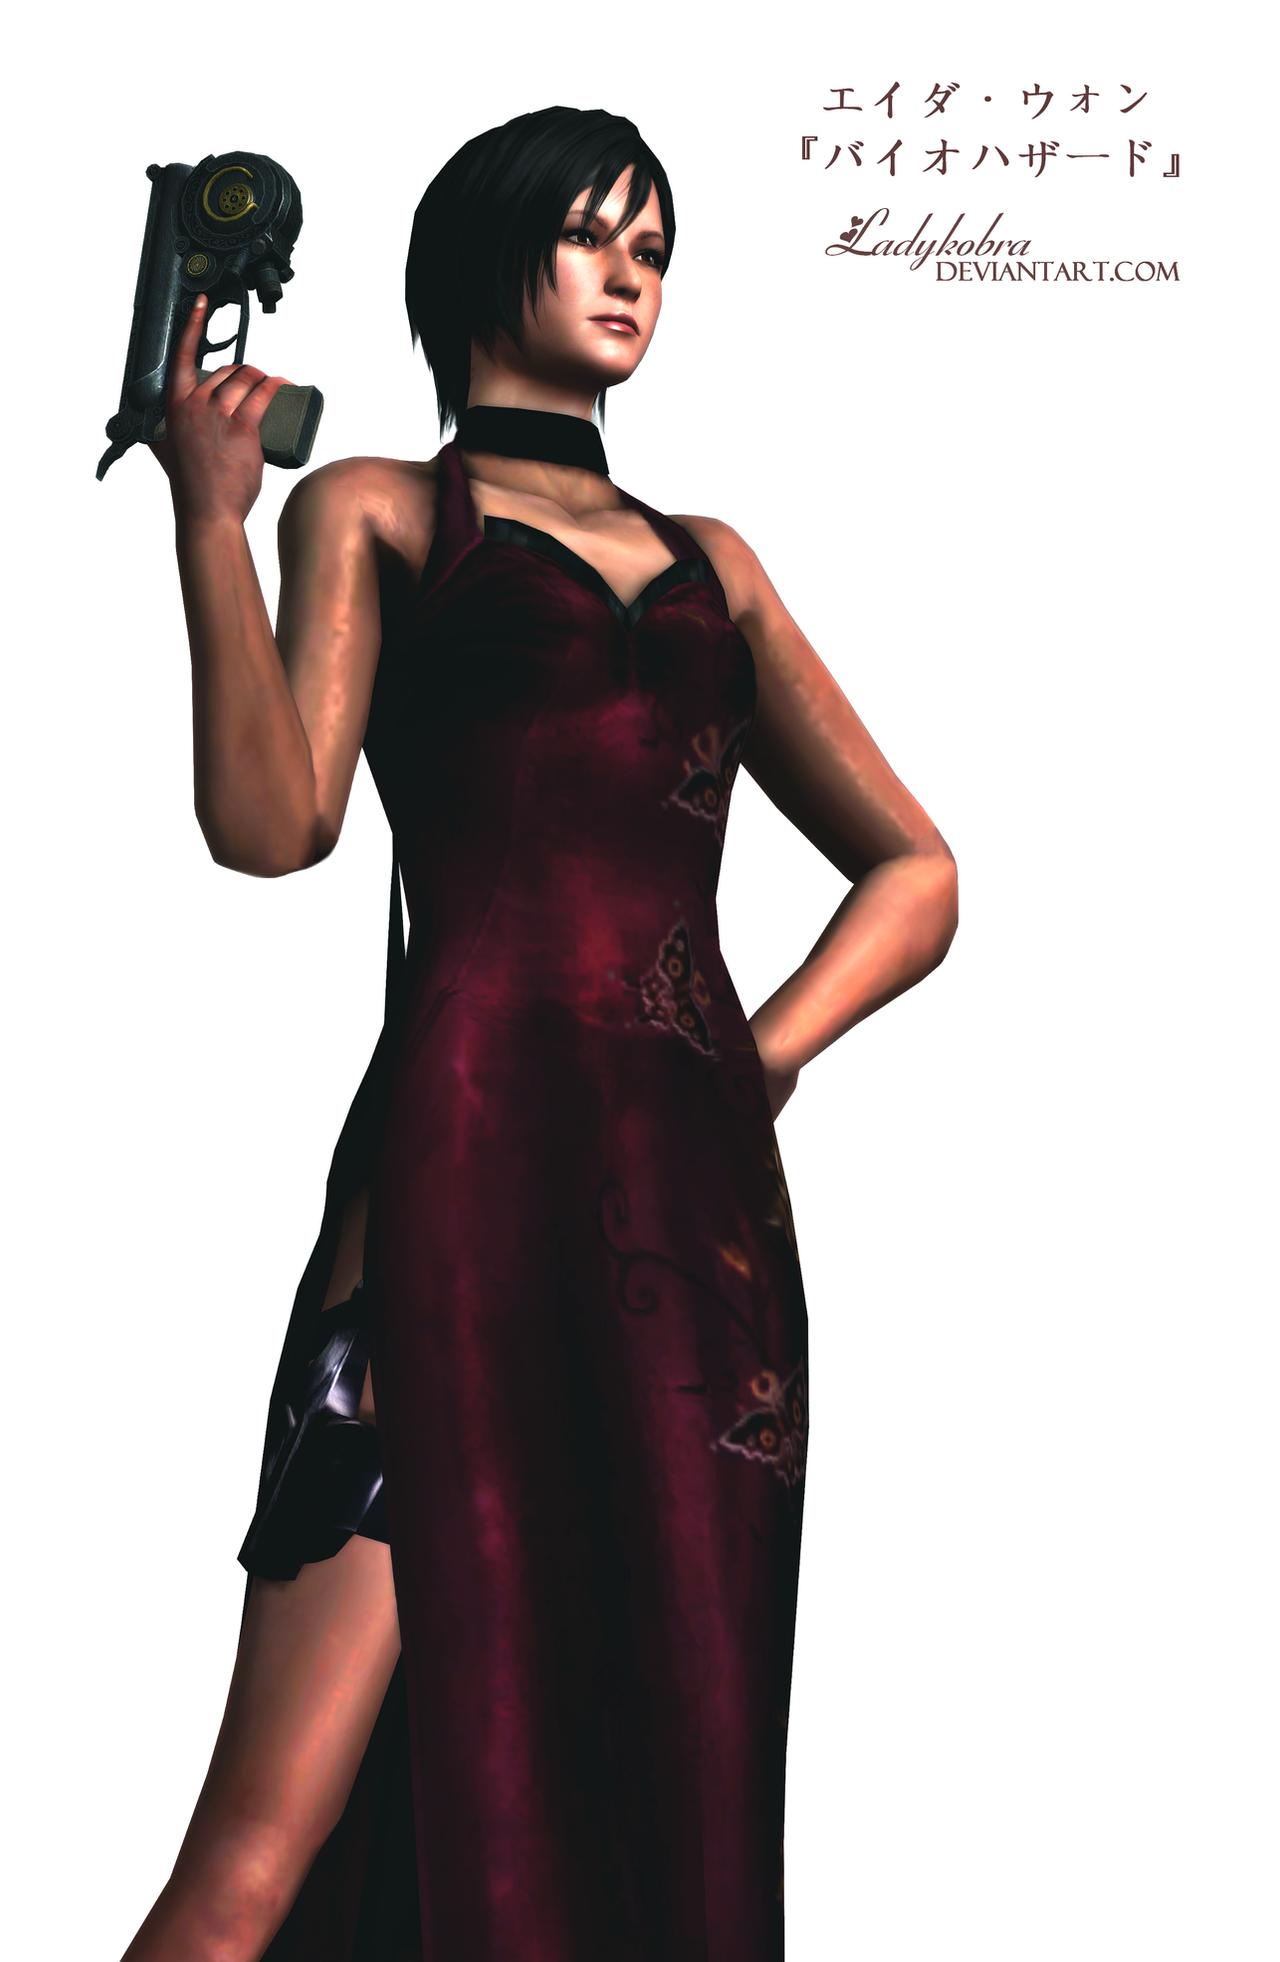 Ada Wong -Render 3- by ladykobra